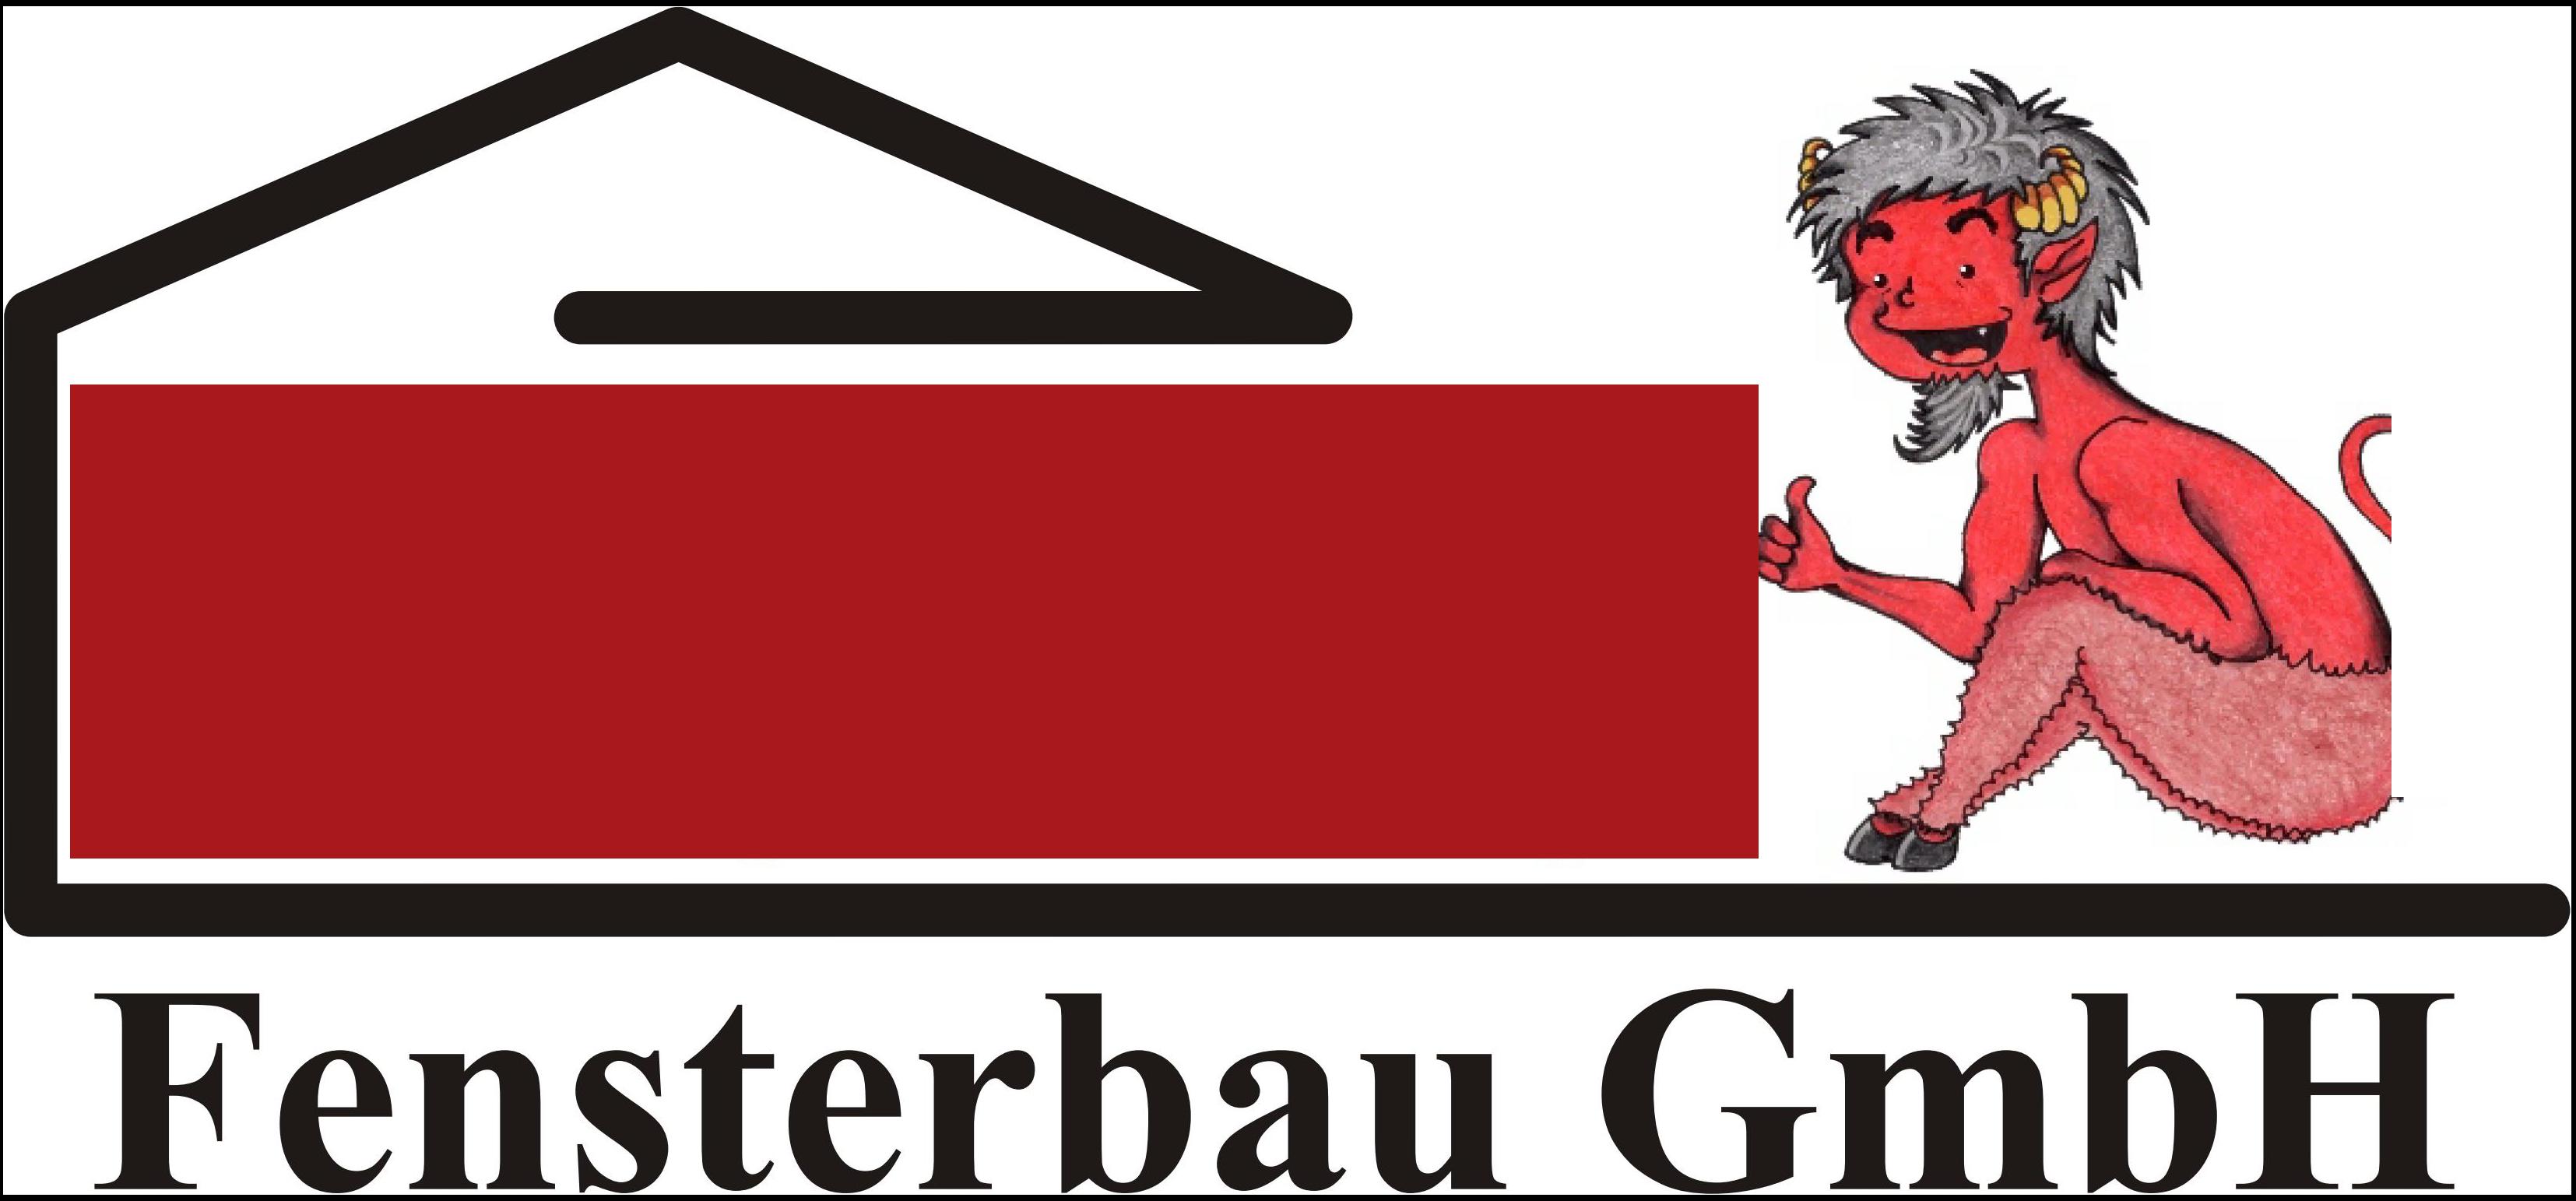 HoRo – Fensterbau GmbH